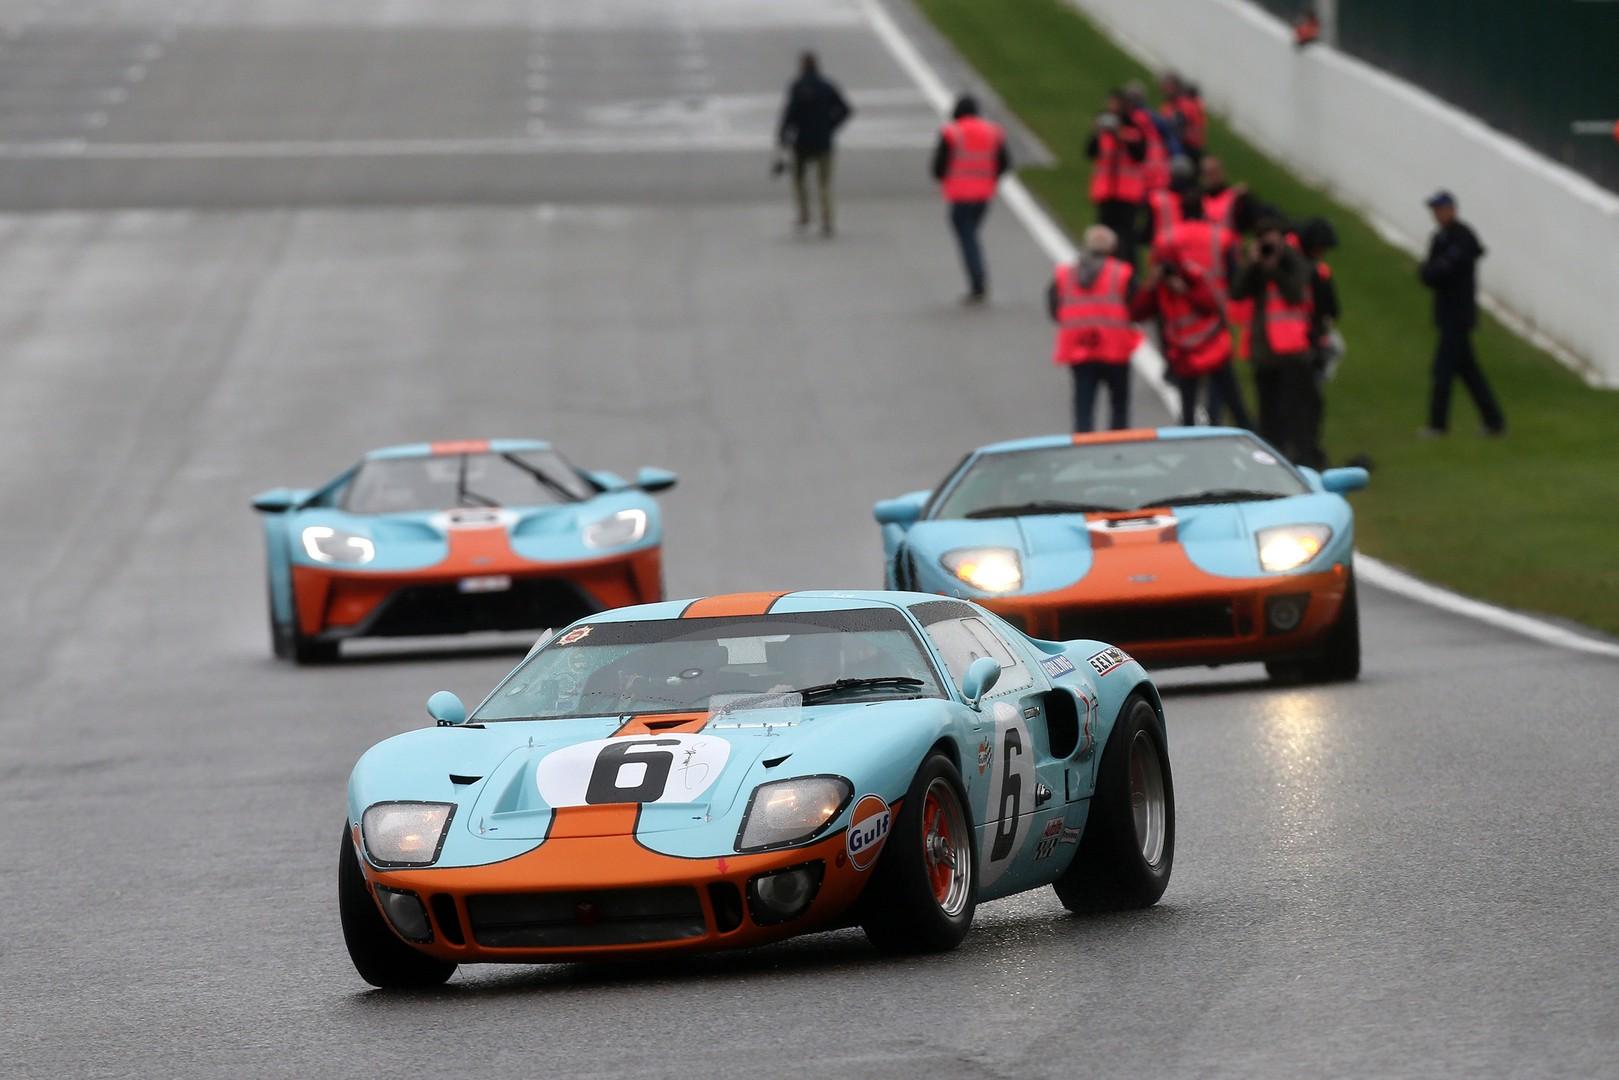 Le Mans 1969: O Jacky Ickx και 72 μοναδικά GT40 και GT αποτίουν φόρο τιμής στην Ford